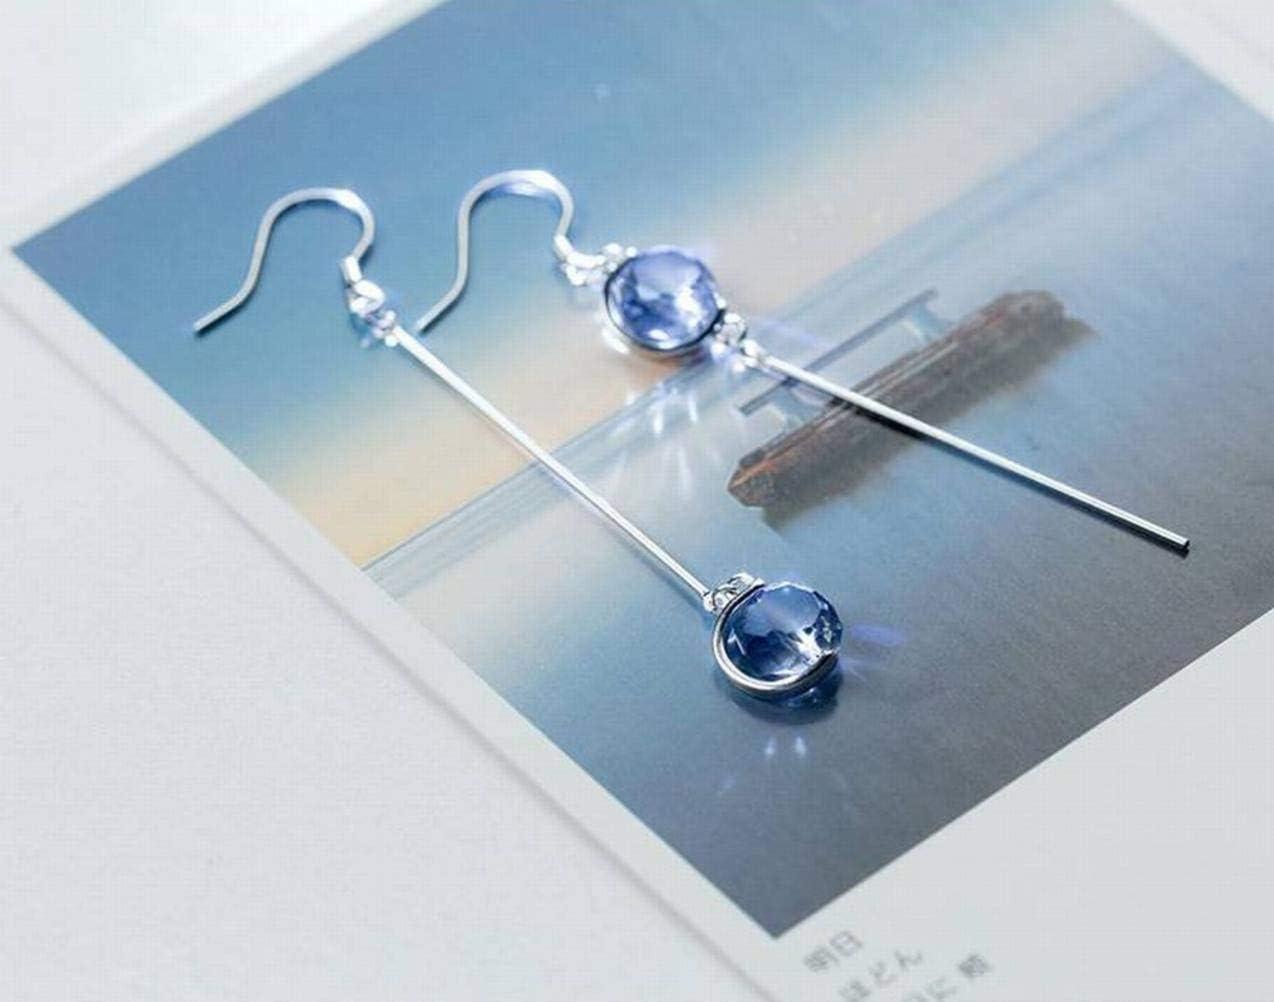 BinLZ S925 Pendientes de Plata Dulce de Mujer Sintético Azucarada Roca Cristal Azul Asimétrico Oreja Larga Joyería Femenina